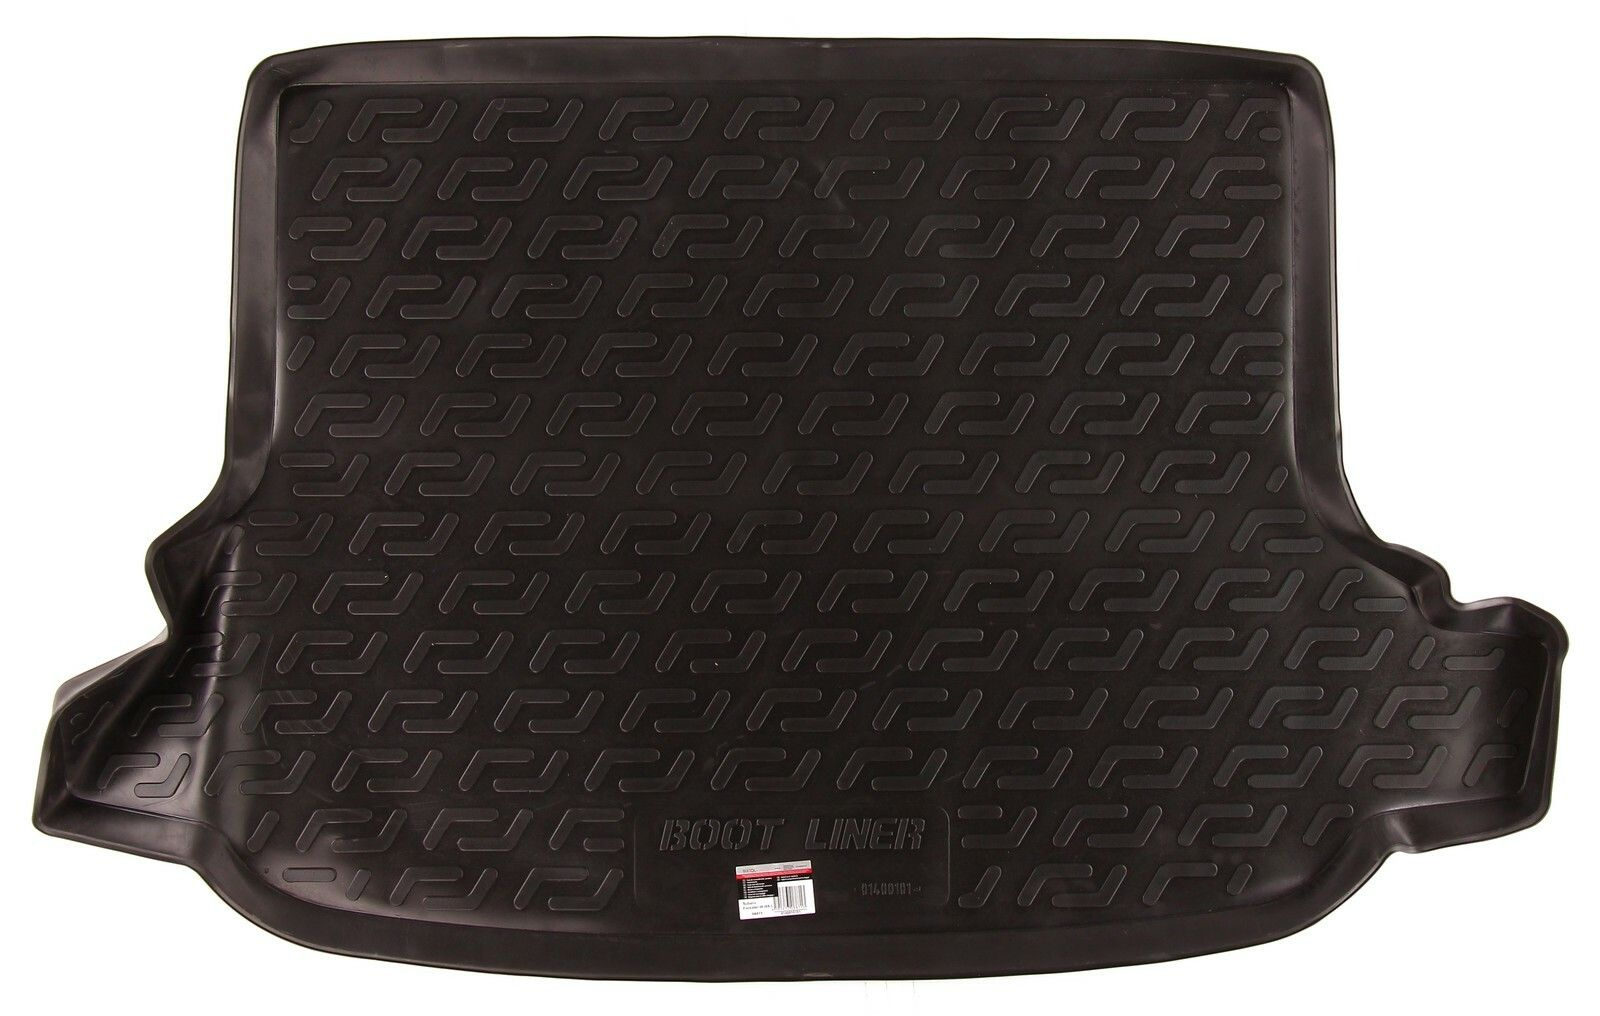 Vana do kufru gumová Subaru Forester III (SH) (08-13) SIXTOL